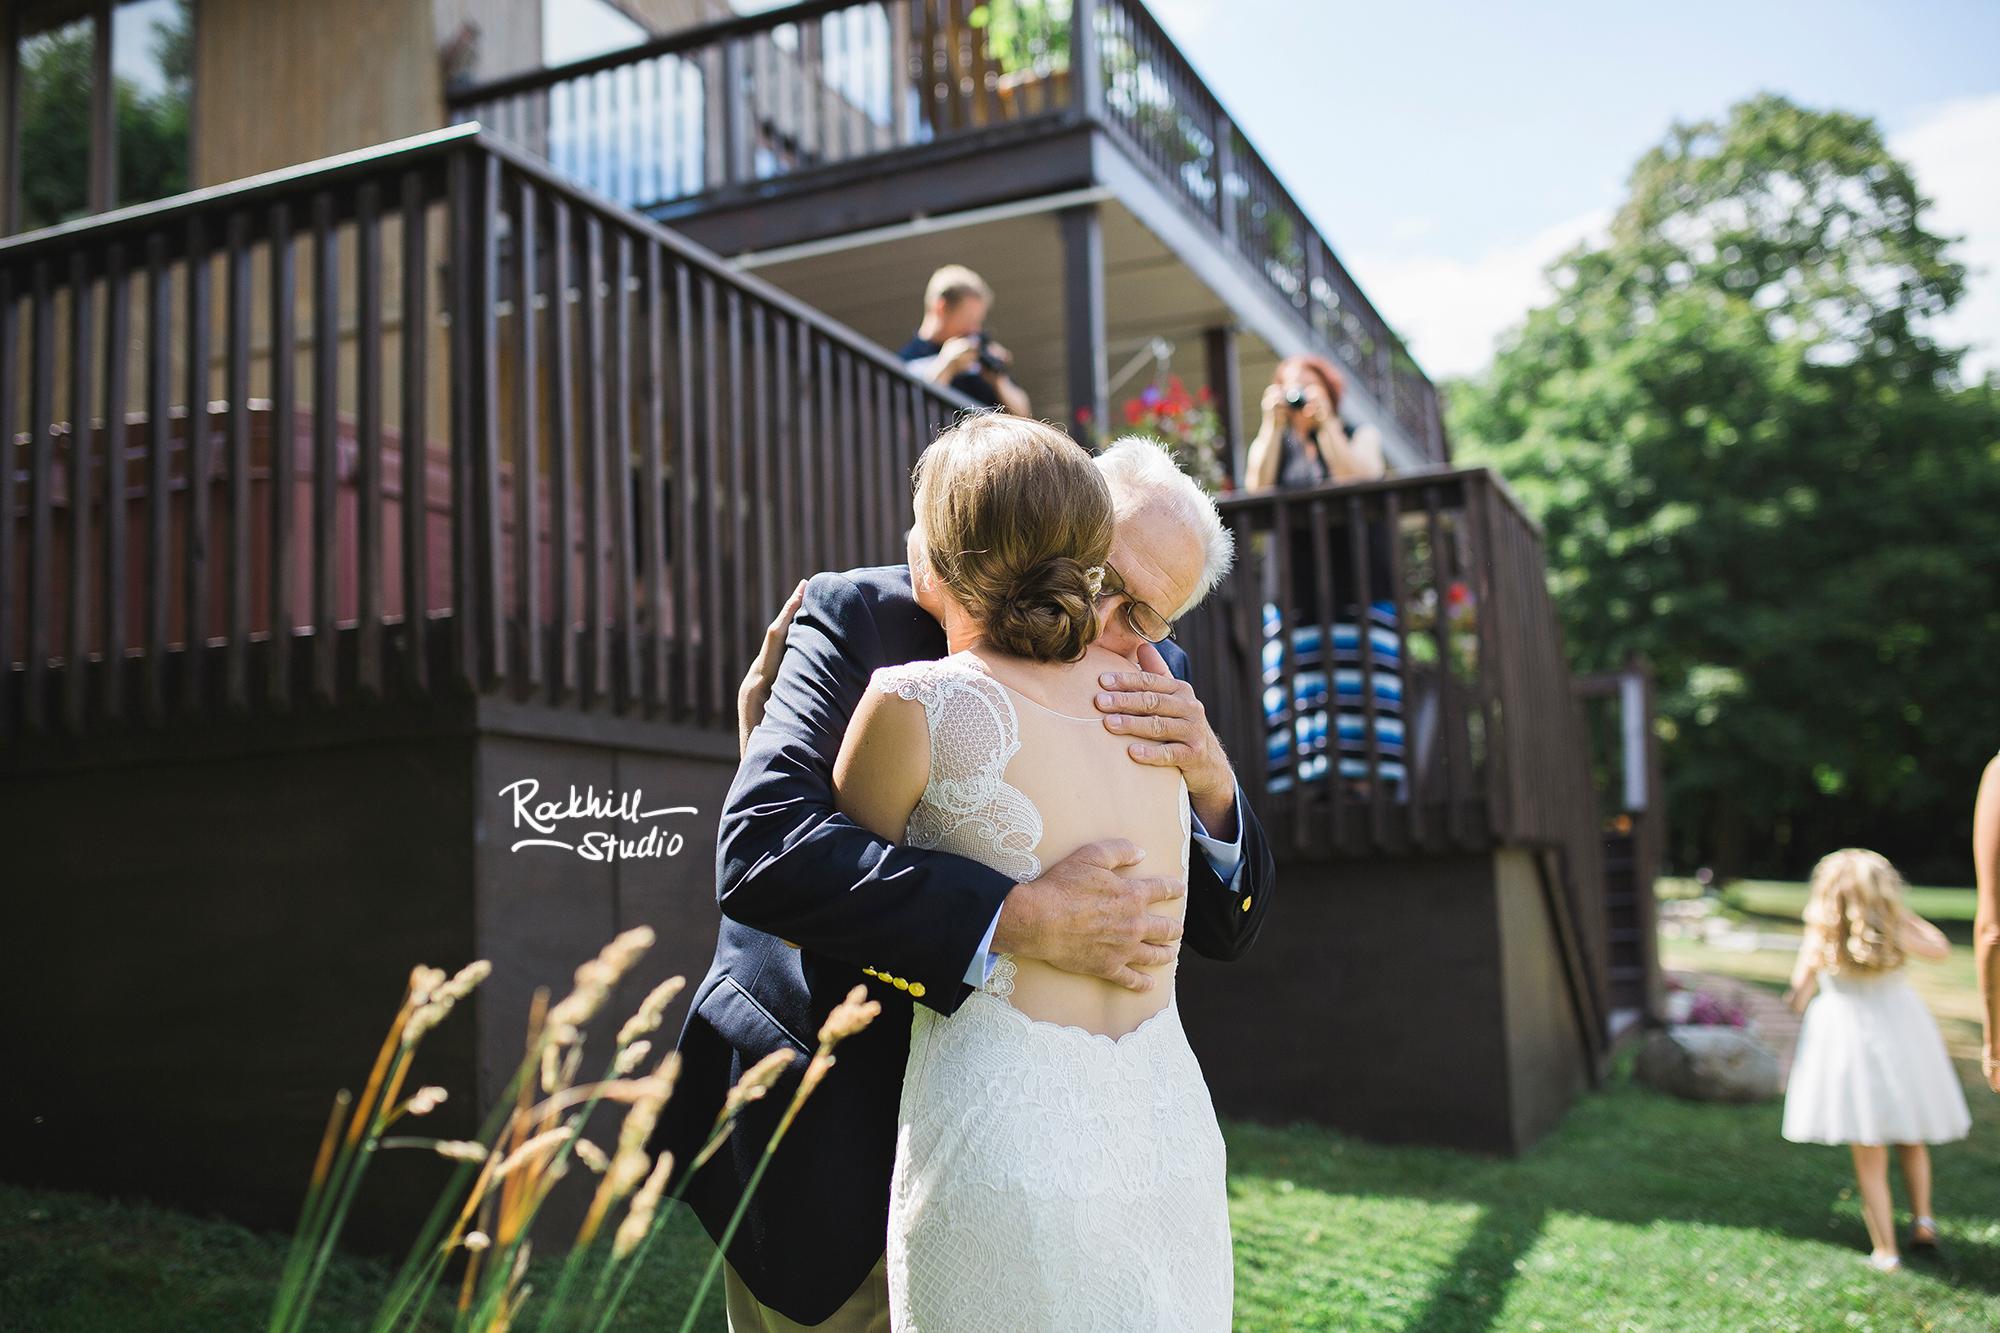 grand-marais-wedding-photographer-upper-peninsula-northern-michigan-rockhill-17.jpg